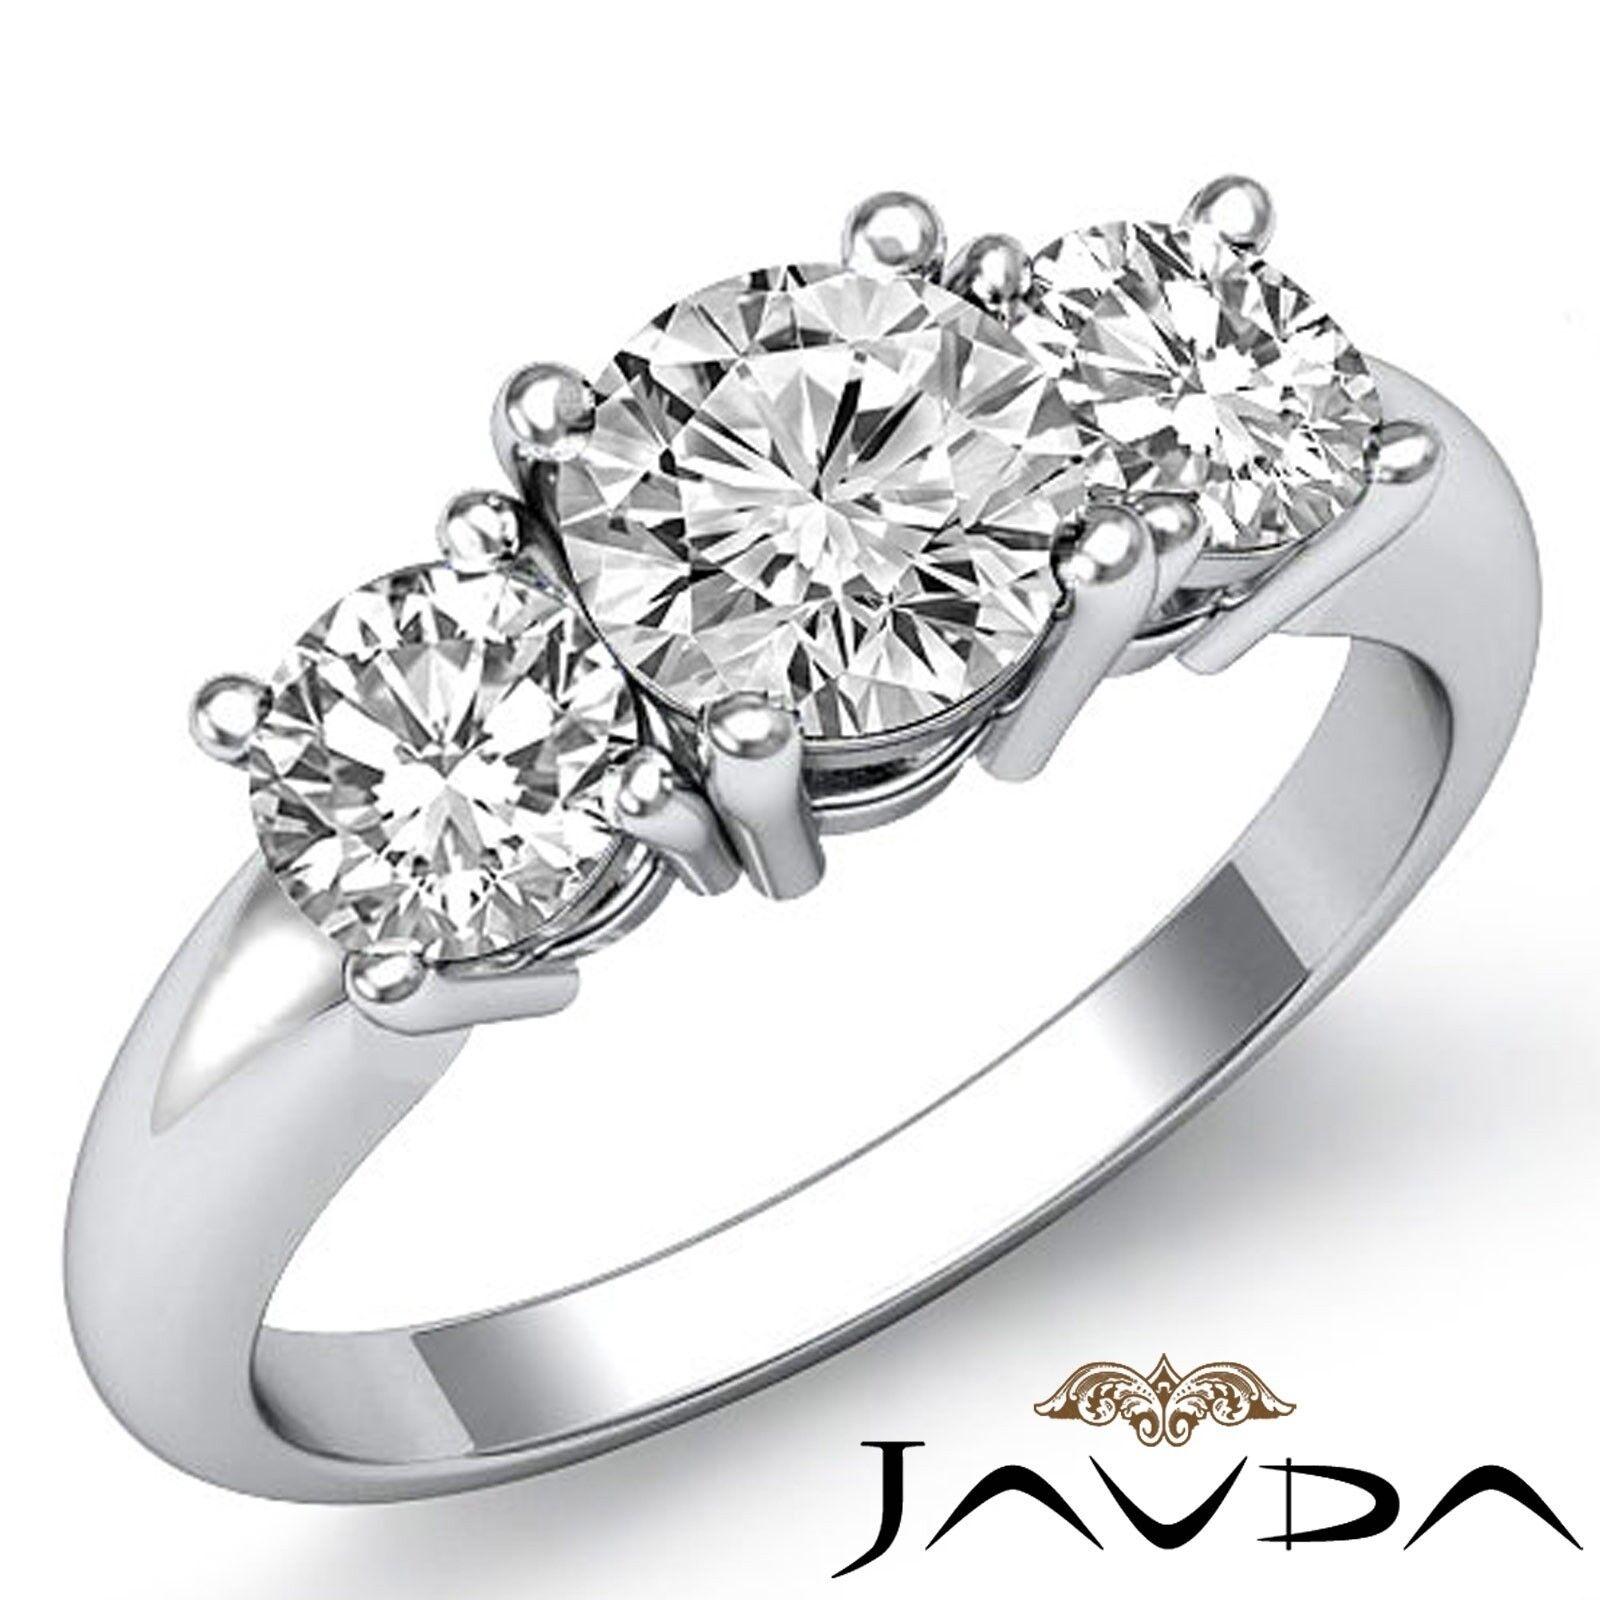 2.6ctw Classic Three Stone Basket Round Diamond Engagement Ring GIA H-SI1 W Gold